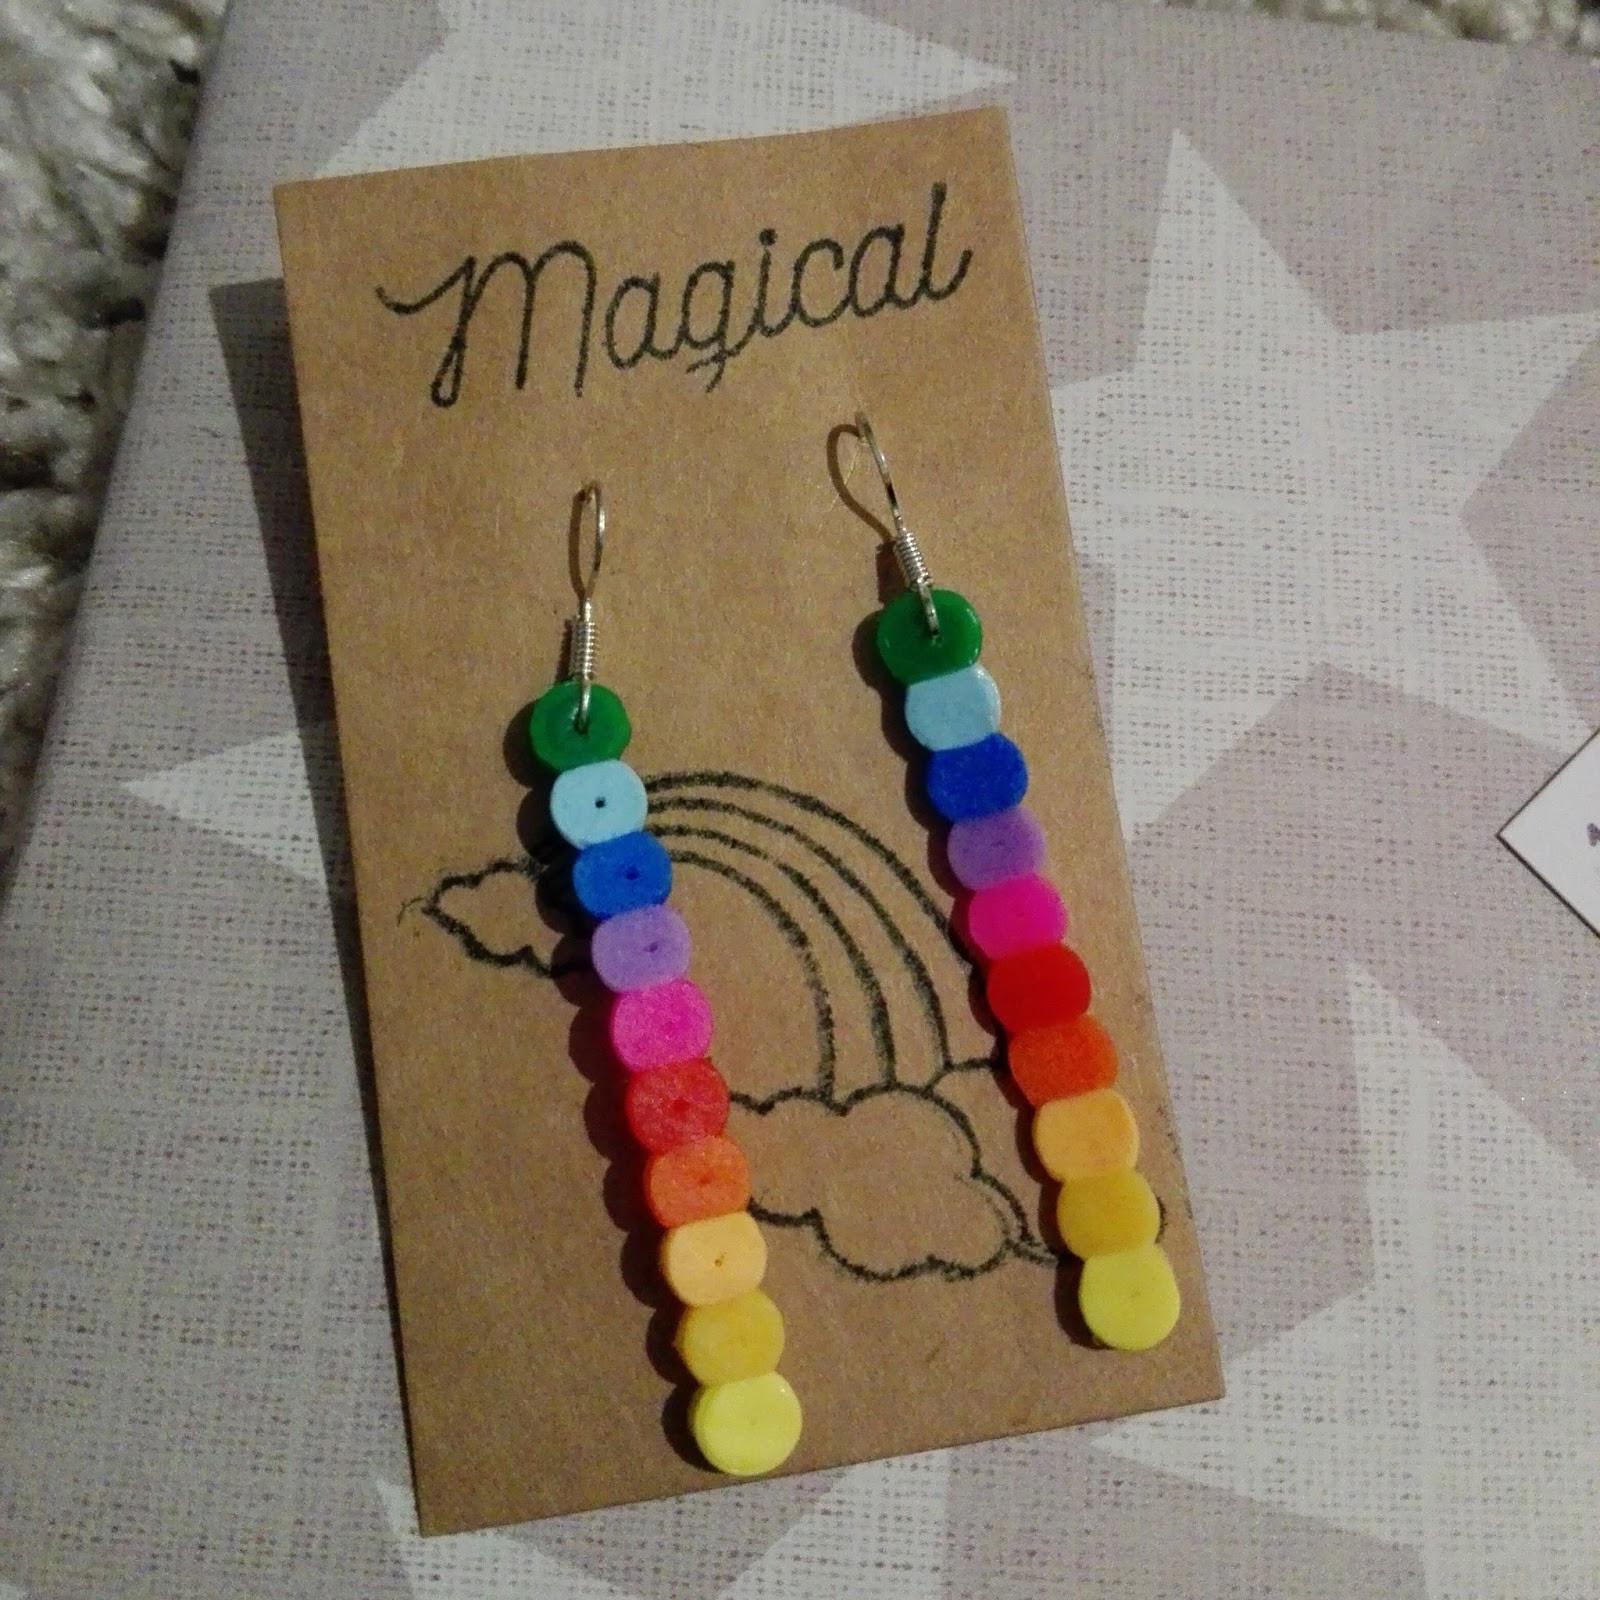 Ohrringe Diy  Lucciola [DIY] Regenbogen Bügelperlen Ohrringe